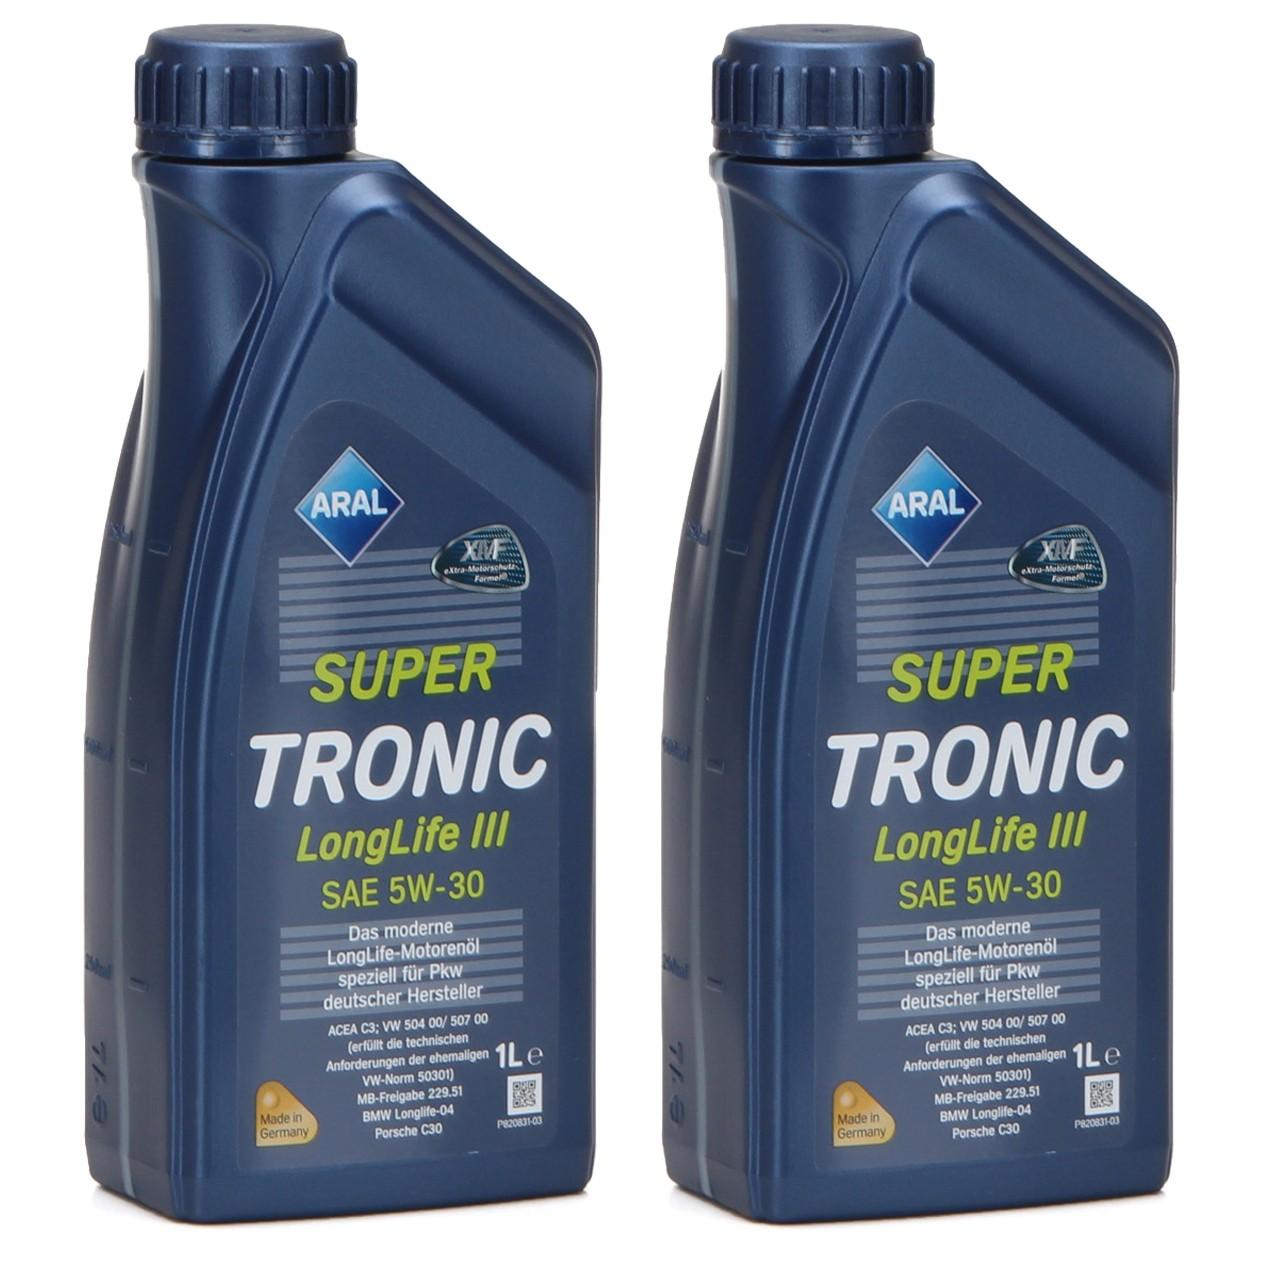 ARAL Motoröl Öl SUPER TRONIC LongLife III 5W30 für VW 504.00/507.00 - 2 Liter